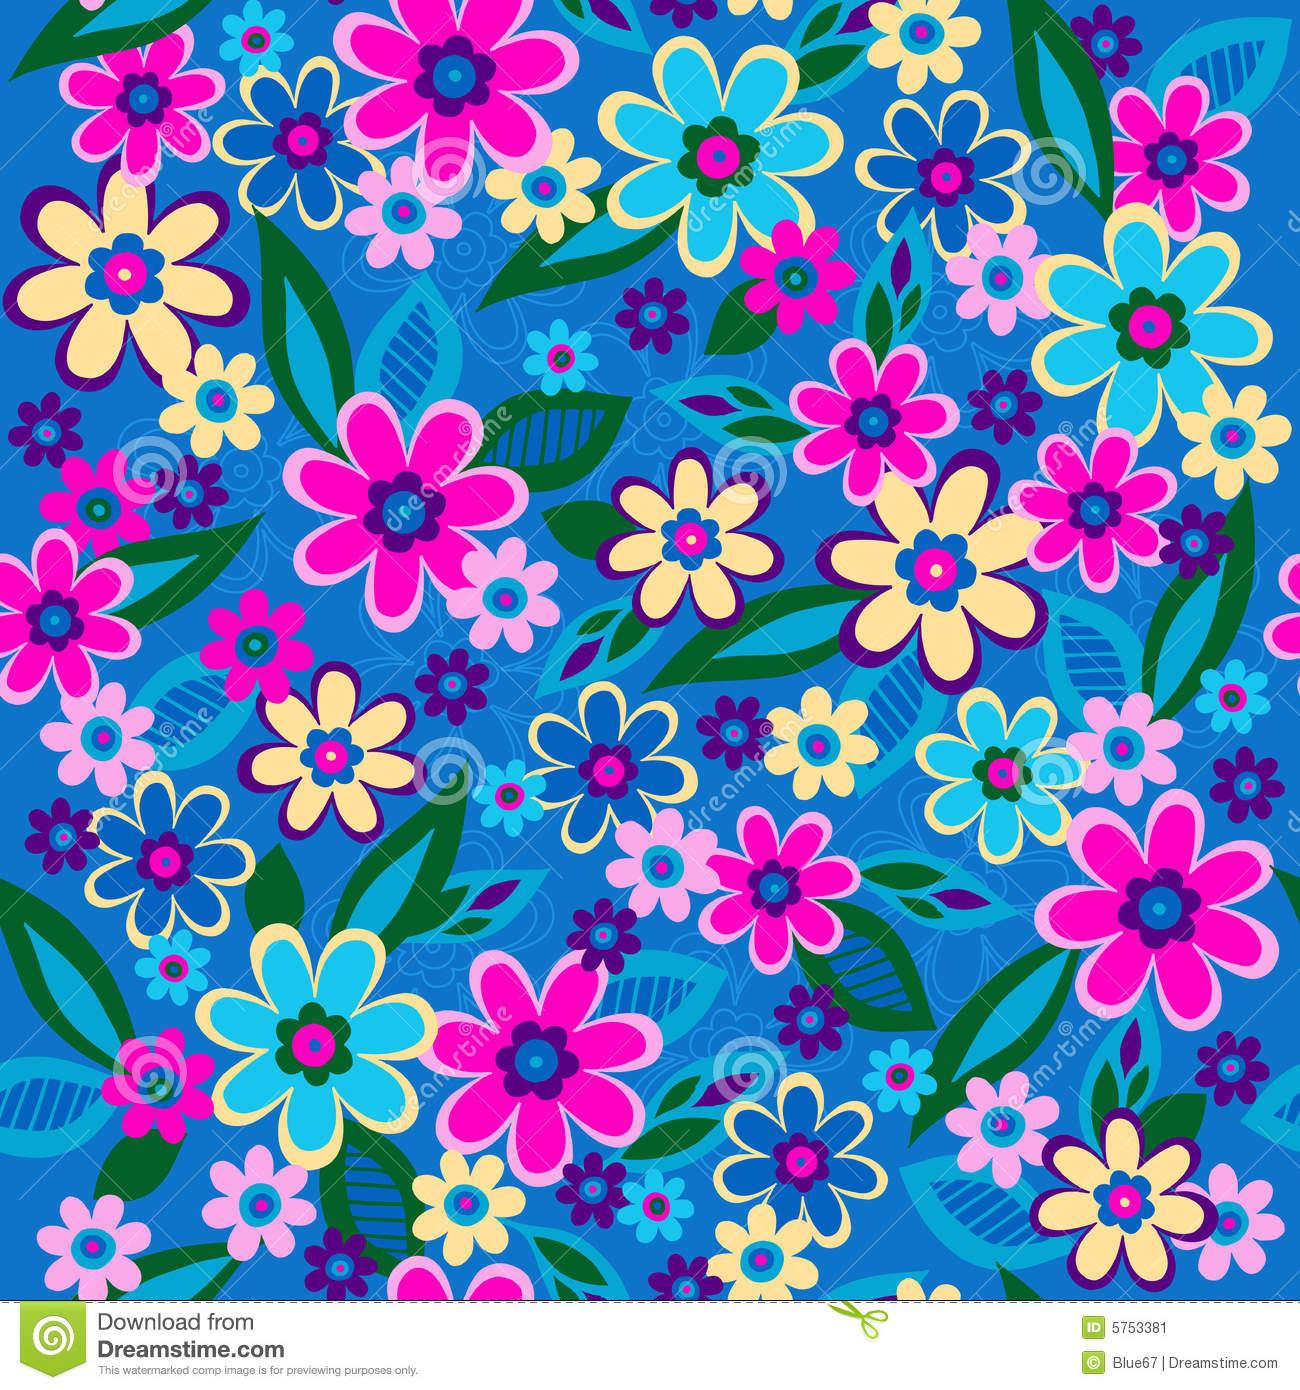 19 Repeating Pattern Vector Flower Images - Floral Pattern Vector. Repeat Flower Designs Patterns and Doodle Flower Pattern Clip Art ...